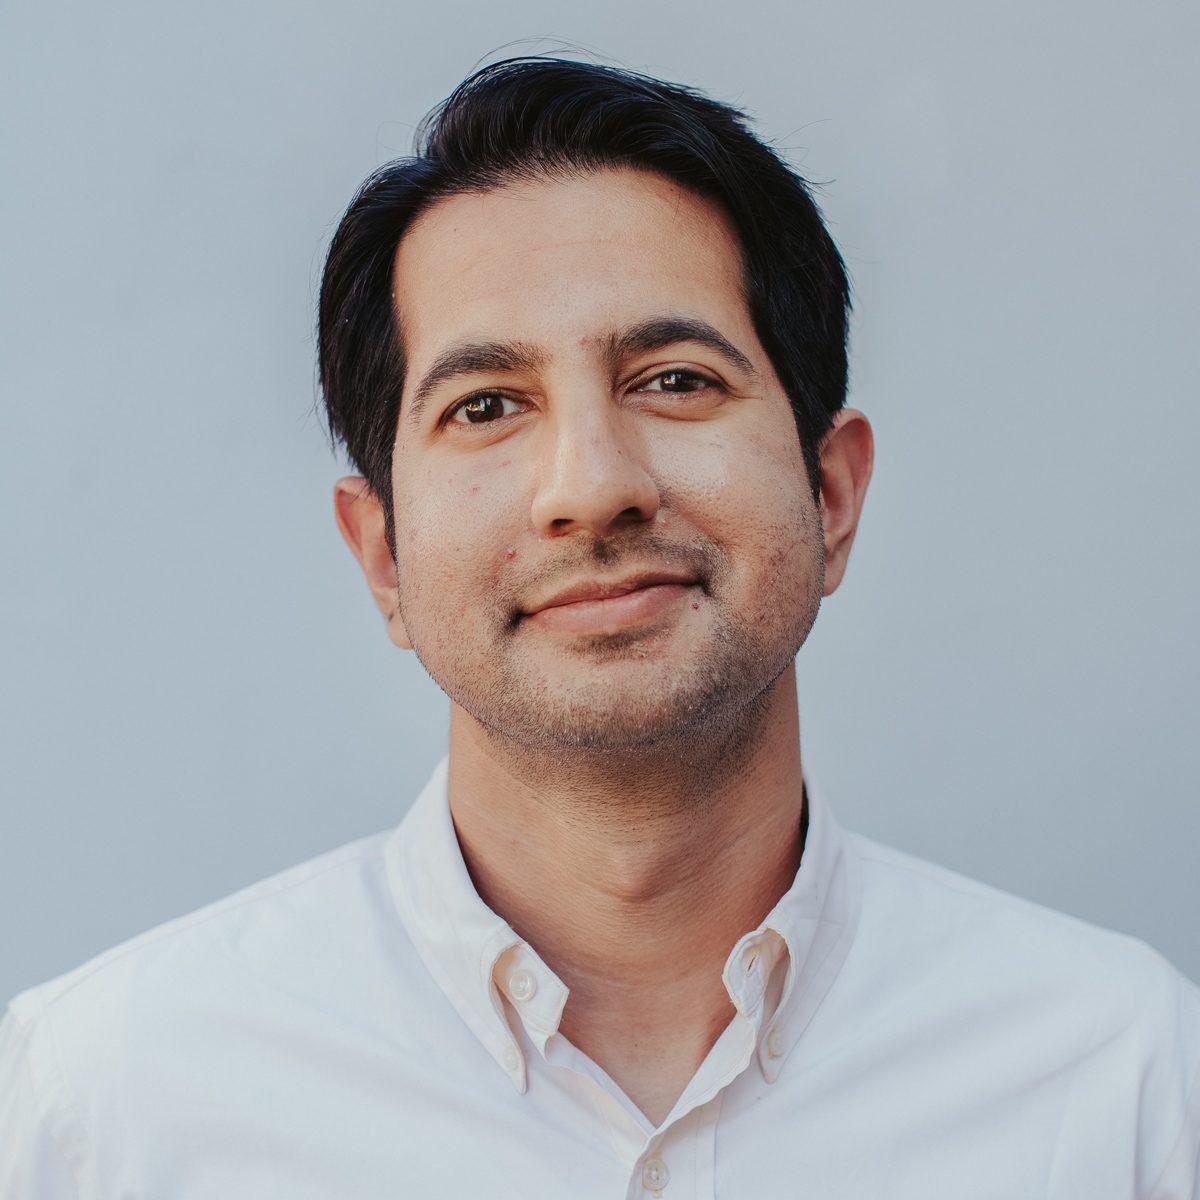 Member - Adil Khan